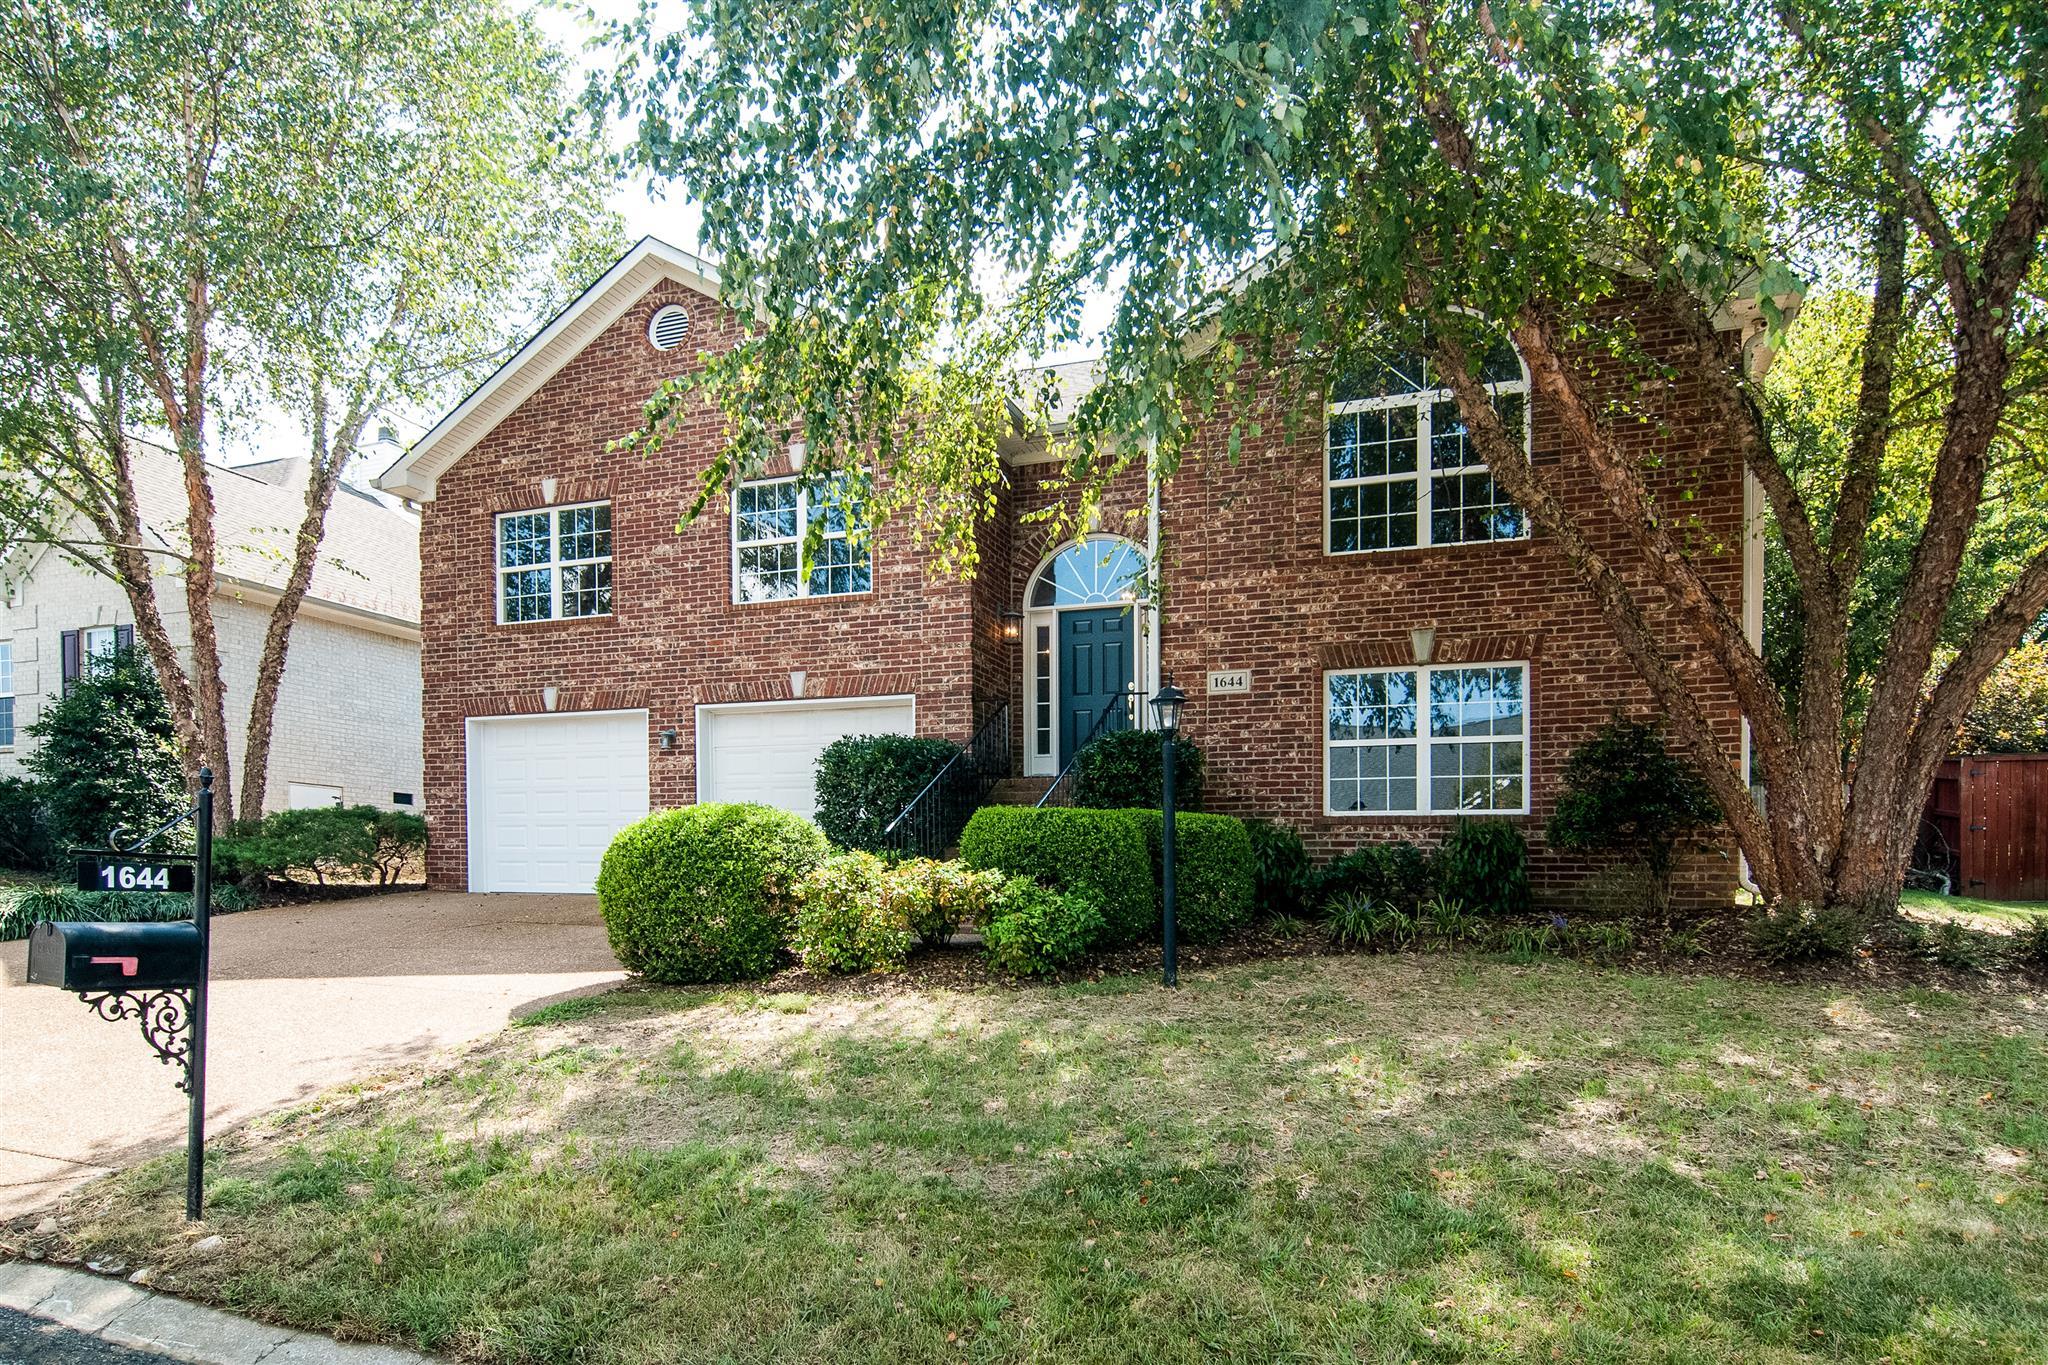 1644 Glenridge Dr, Bellevue in Davidson County County, TN 37221 Home for Sale